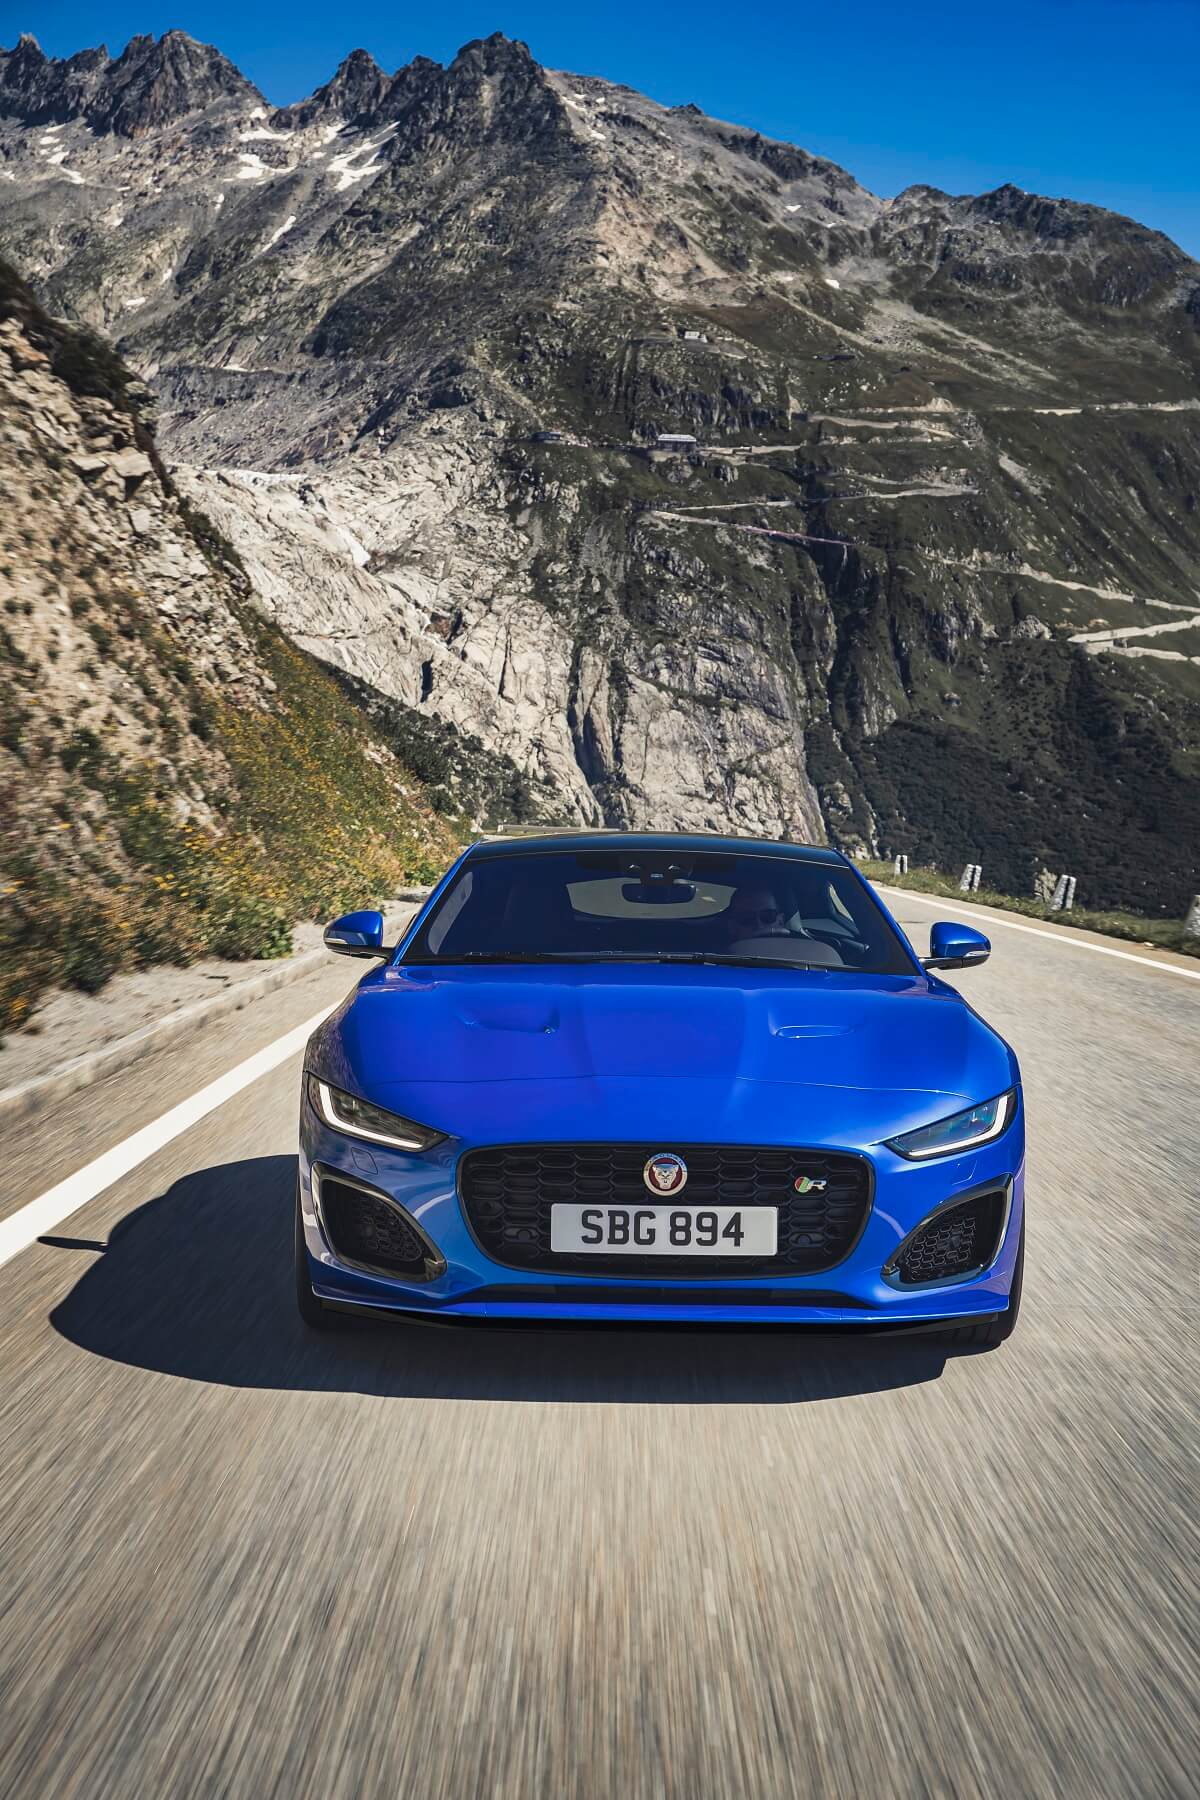 Jag_F-TYPE_R_21MY_Velocity_Blue_Reveal_Switzerland_02.12.19_07.jpg